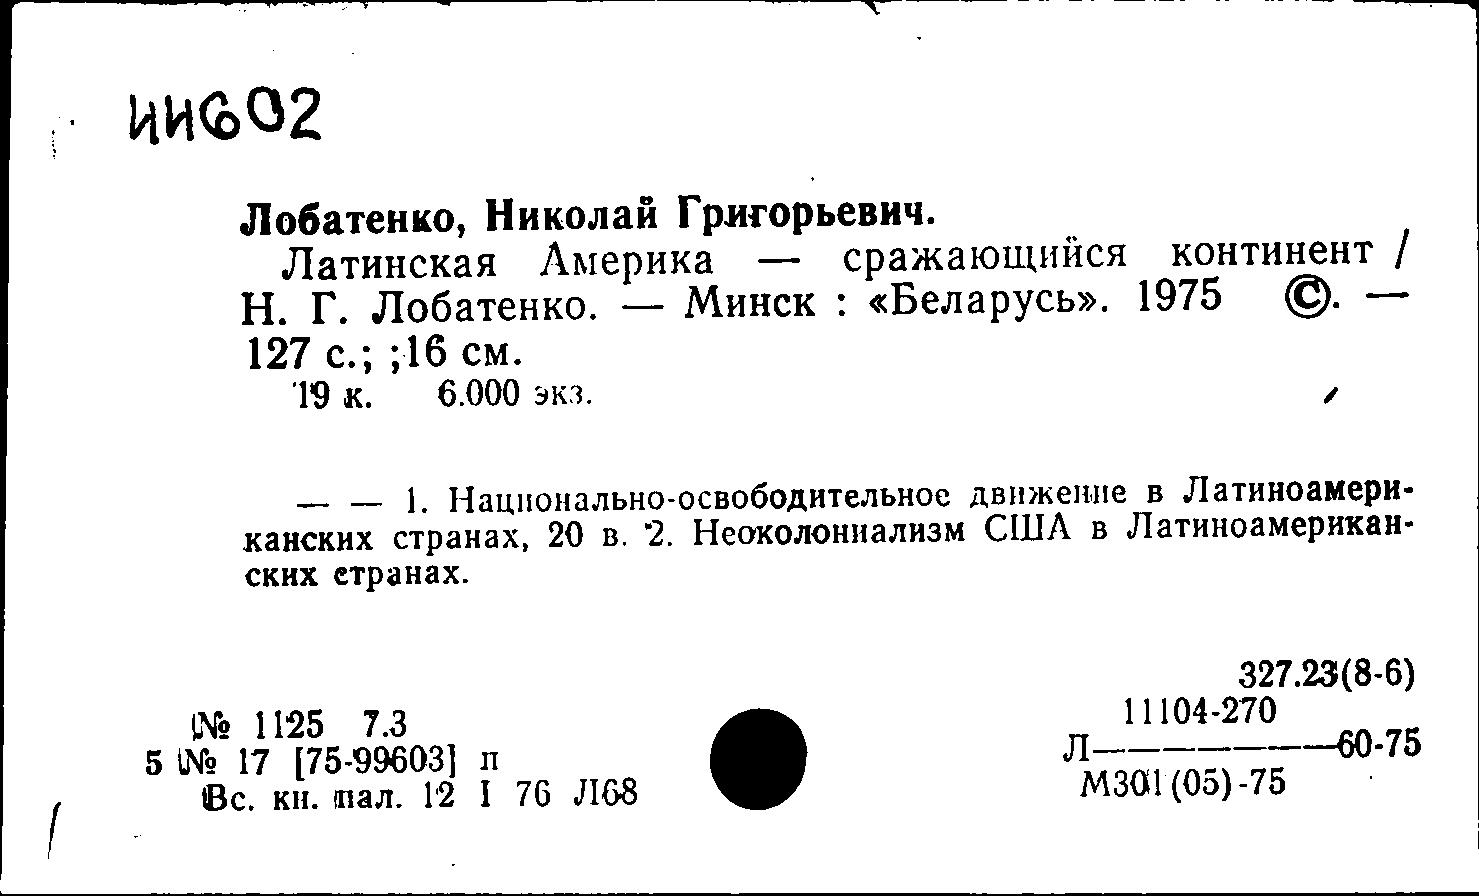 solkoderm - Bőrgyulladás September